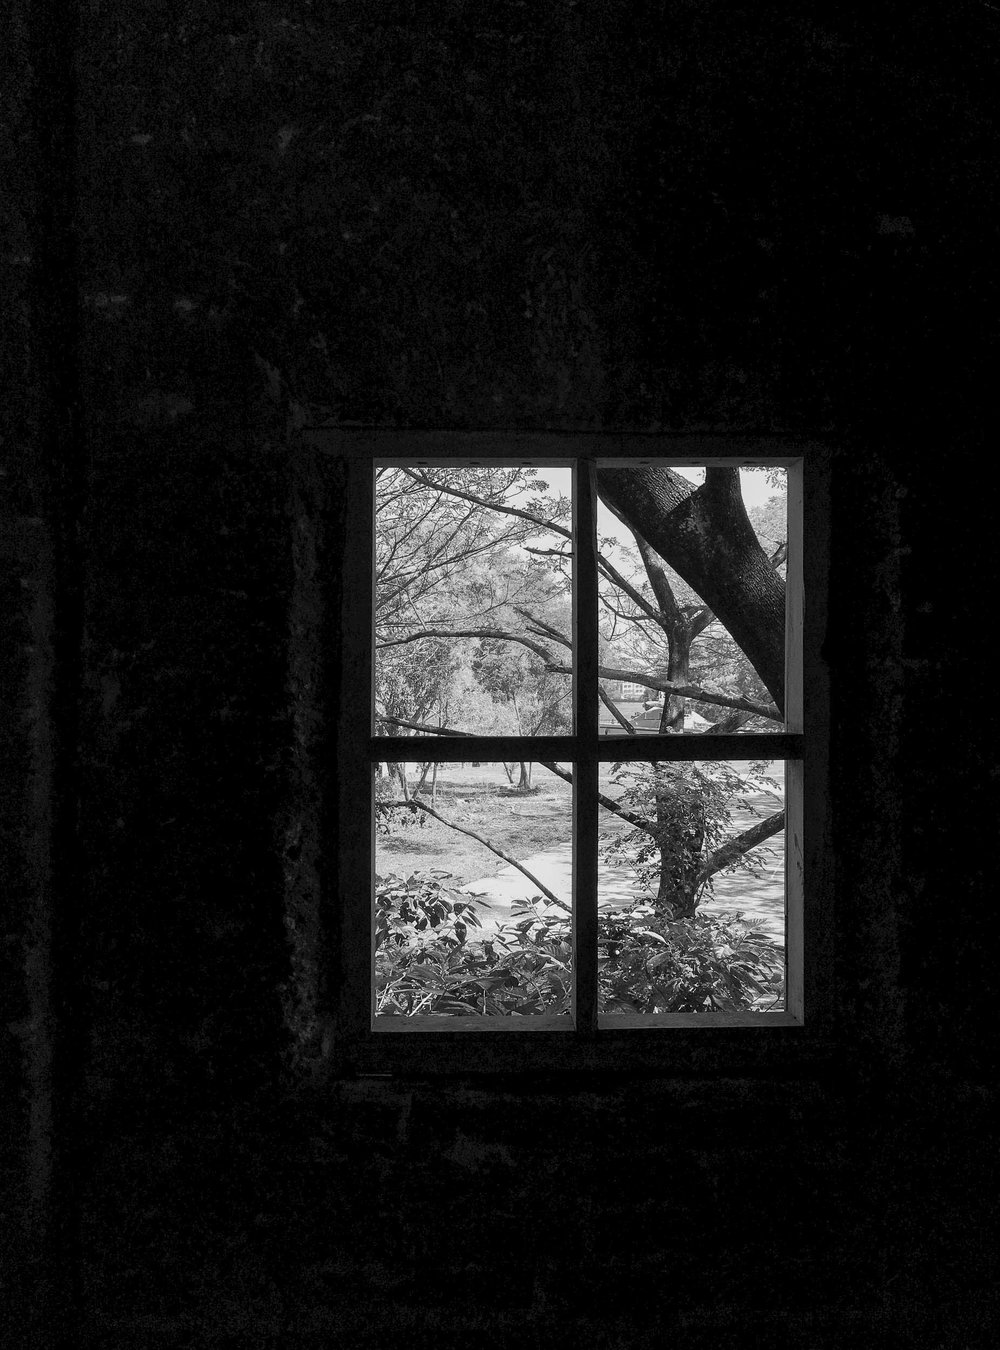 Sindhur_Photography_Kochi Muziris Biennale -2019-40.JPG